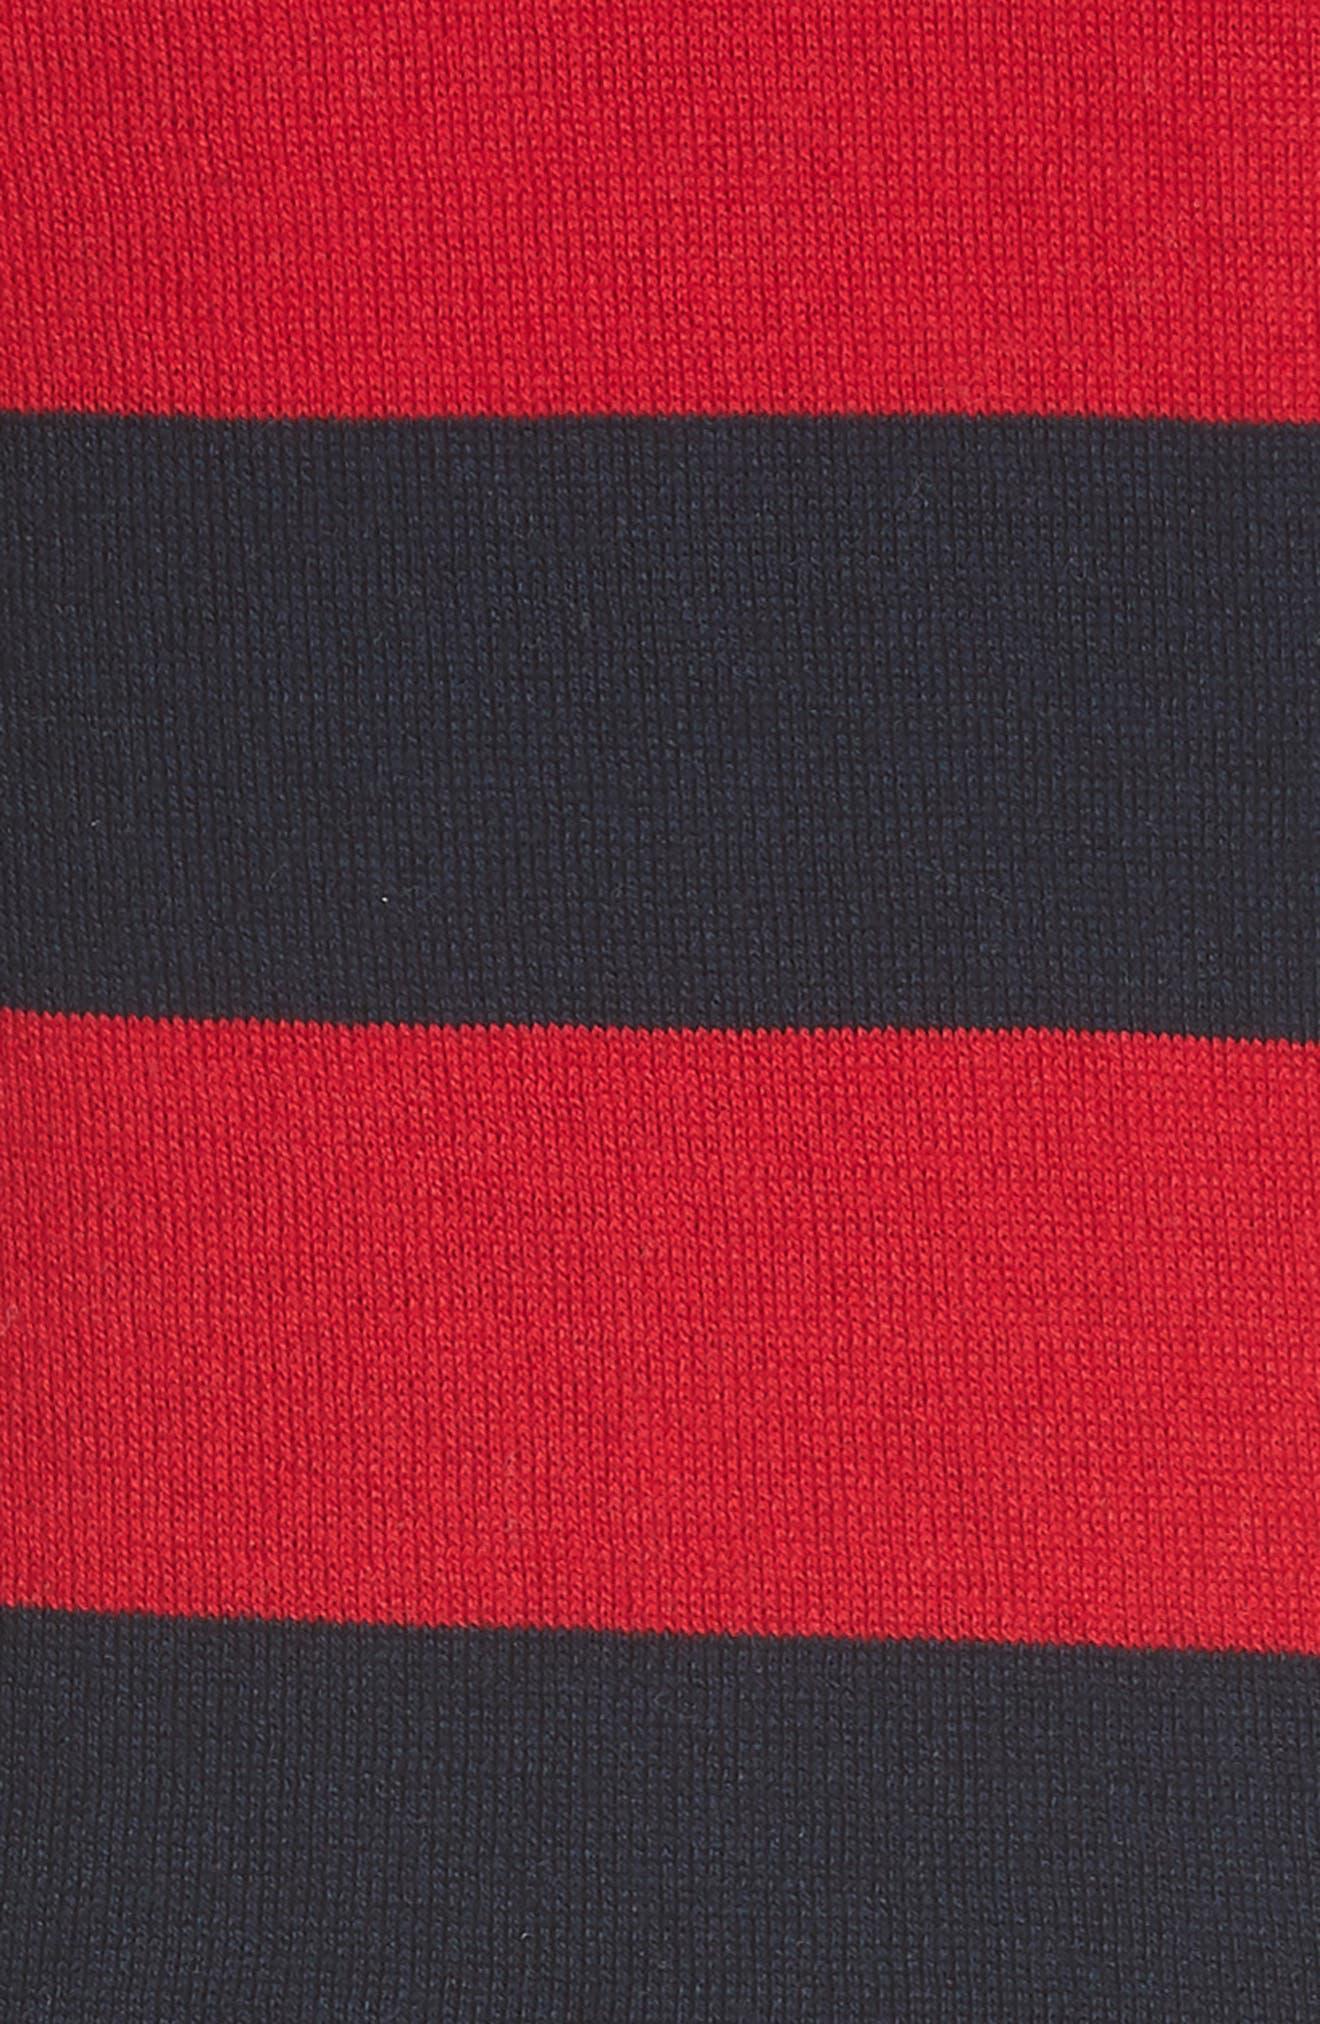 Ecedra Asymmetrical Stripe Faux Wrap Dress,                             Alternate thumbnail 5, color,                             Midnight Cherry